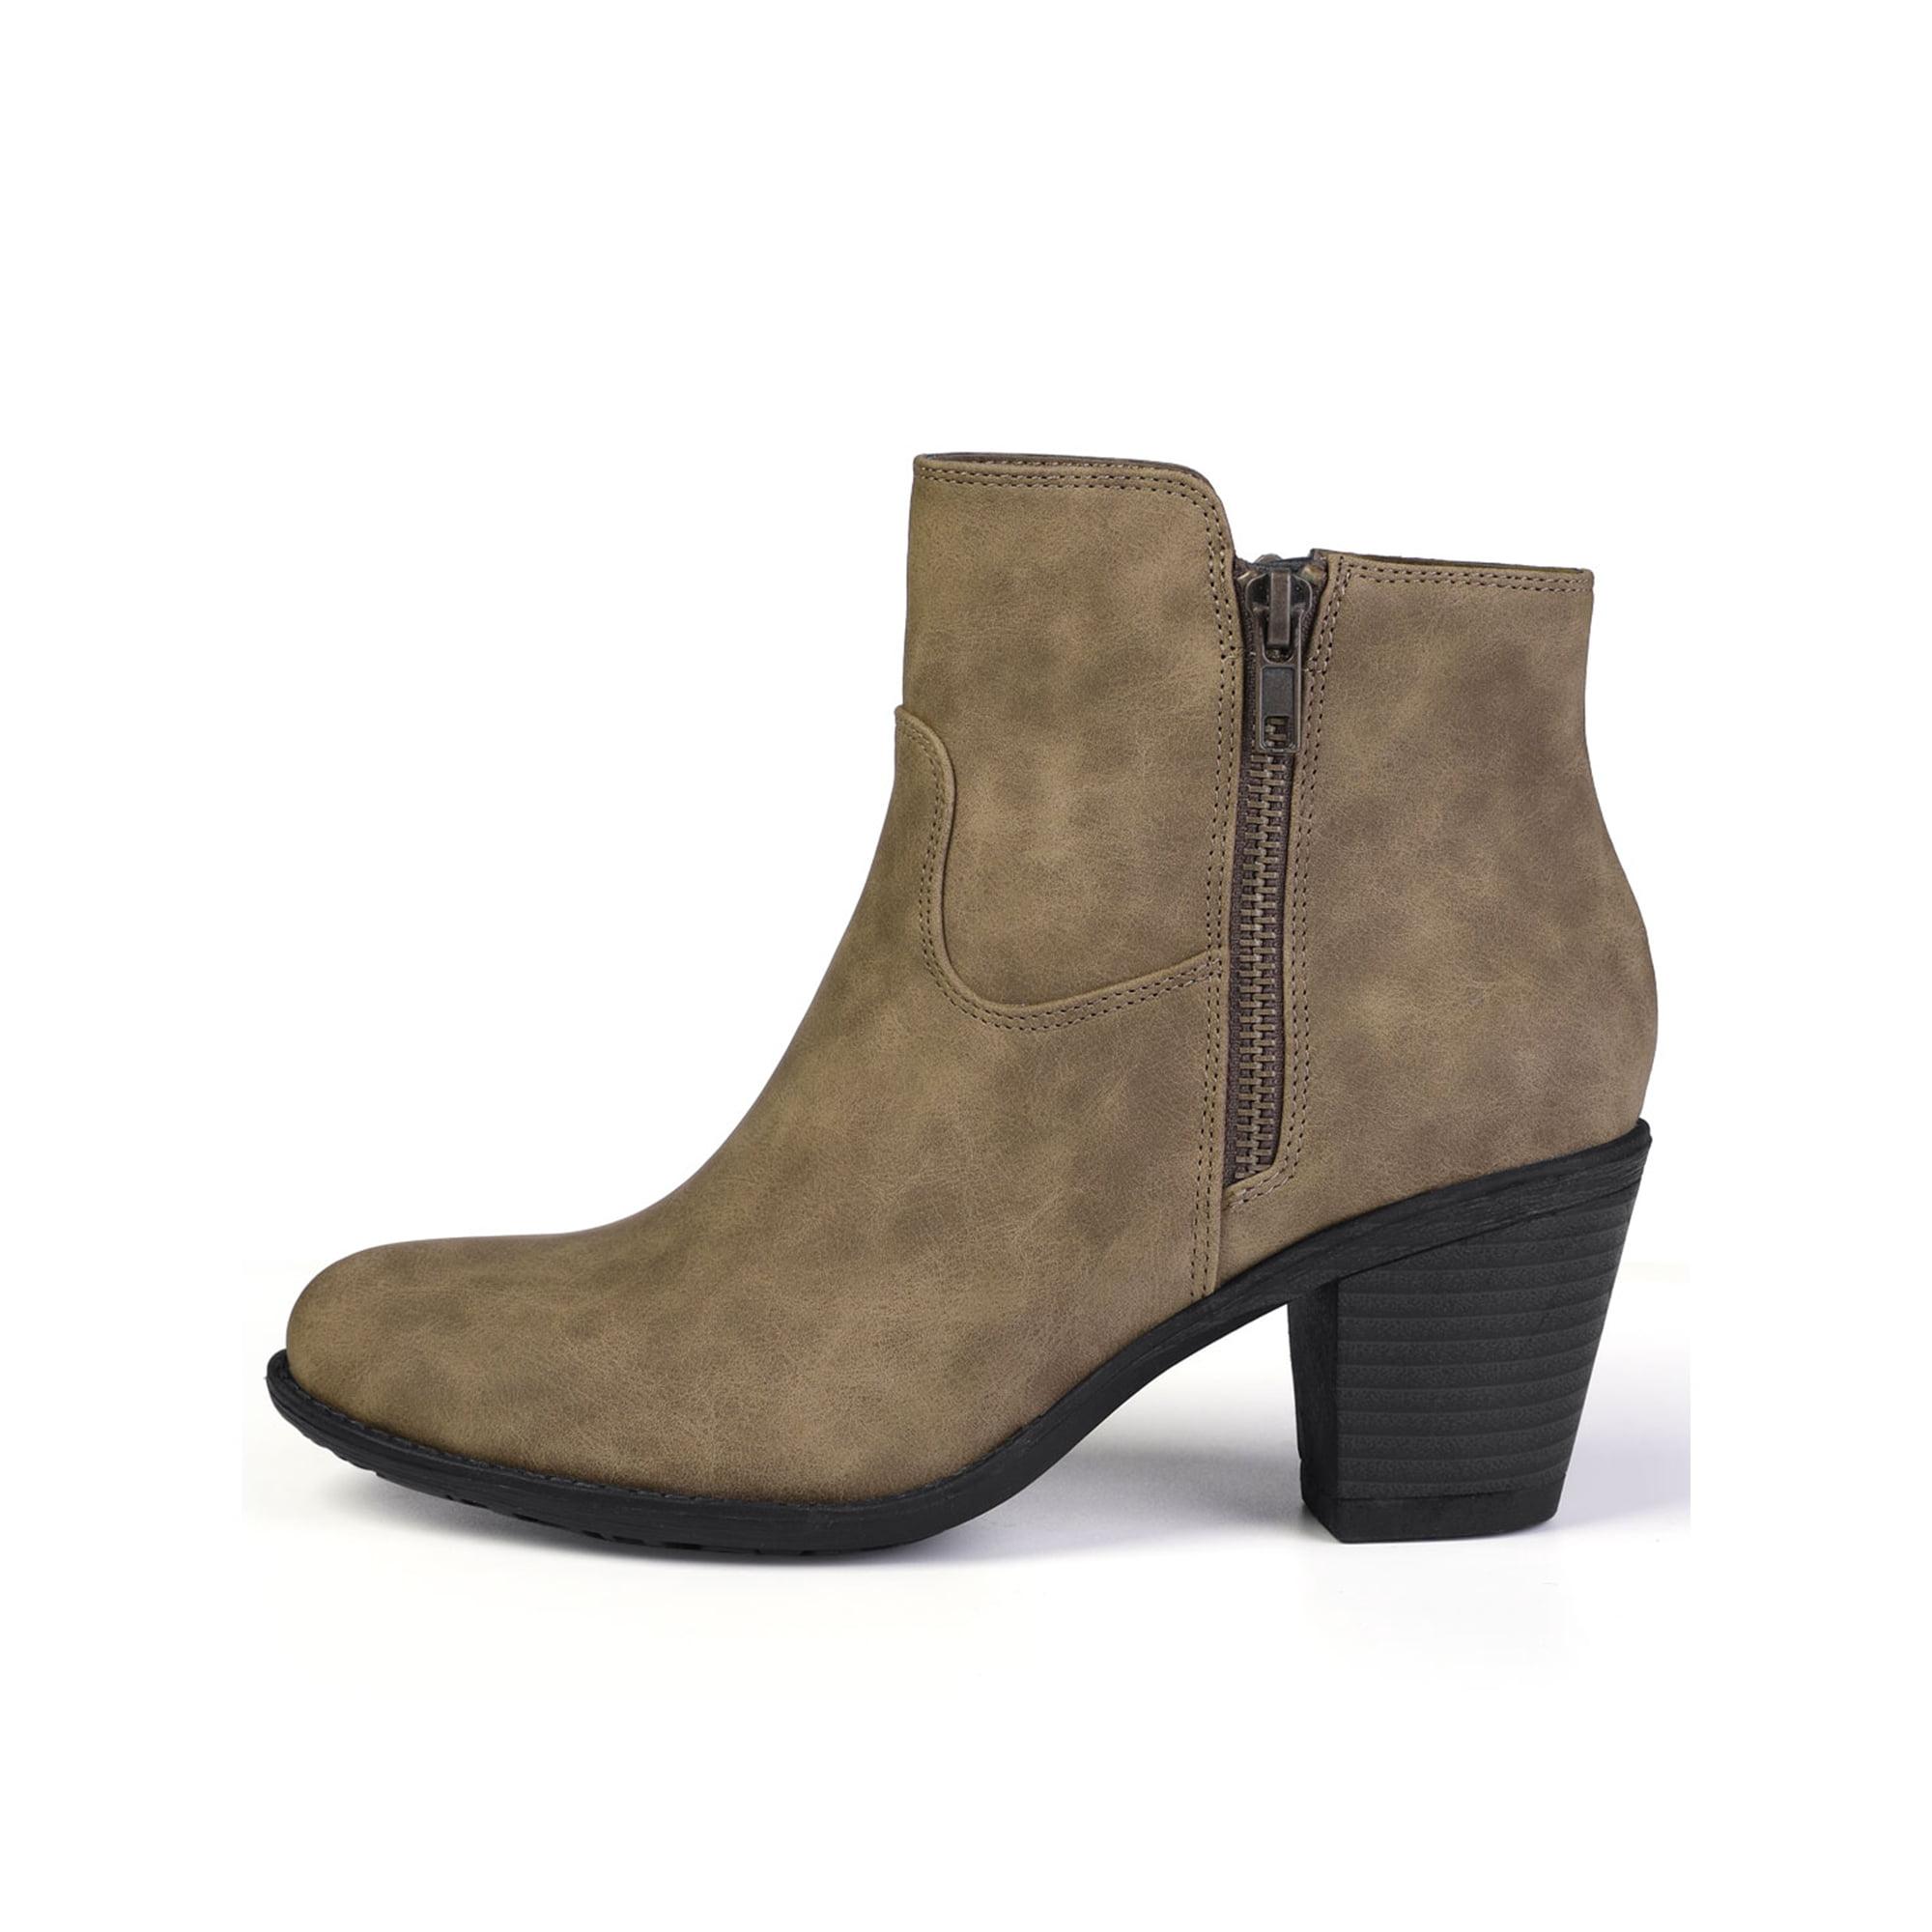 e7071c7af2 Unique Bargain Women's Round Toe Chunky Heel Zipper Ankle Boots Black (Size  6)